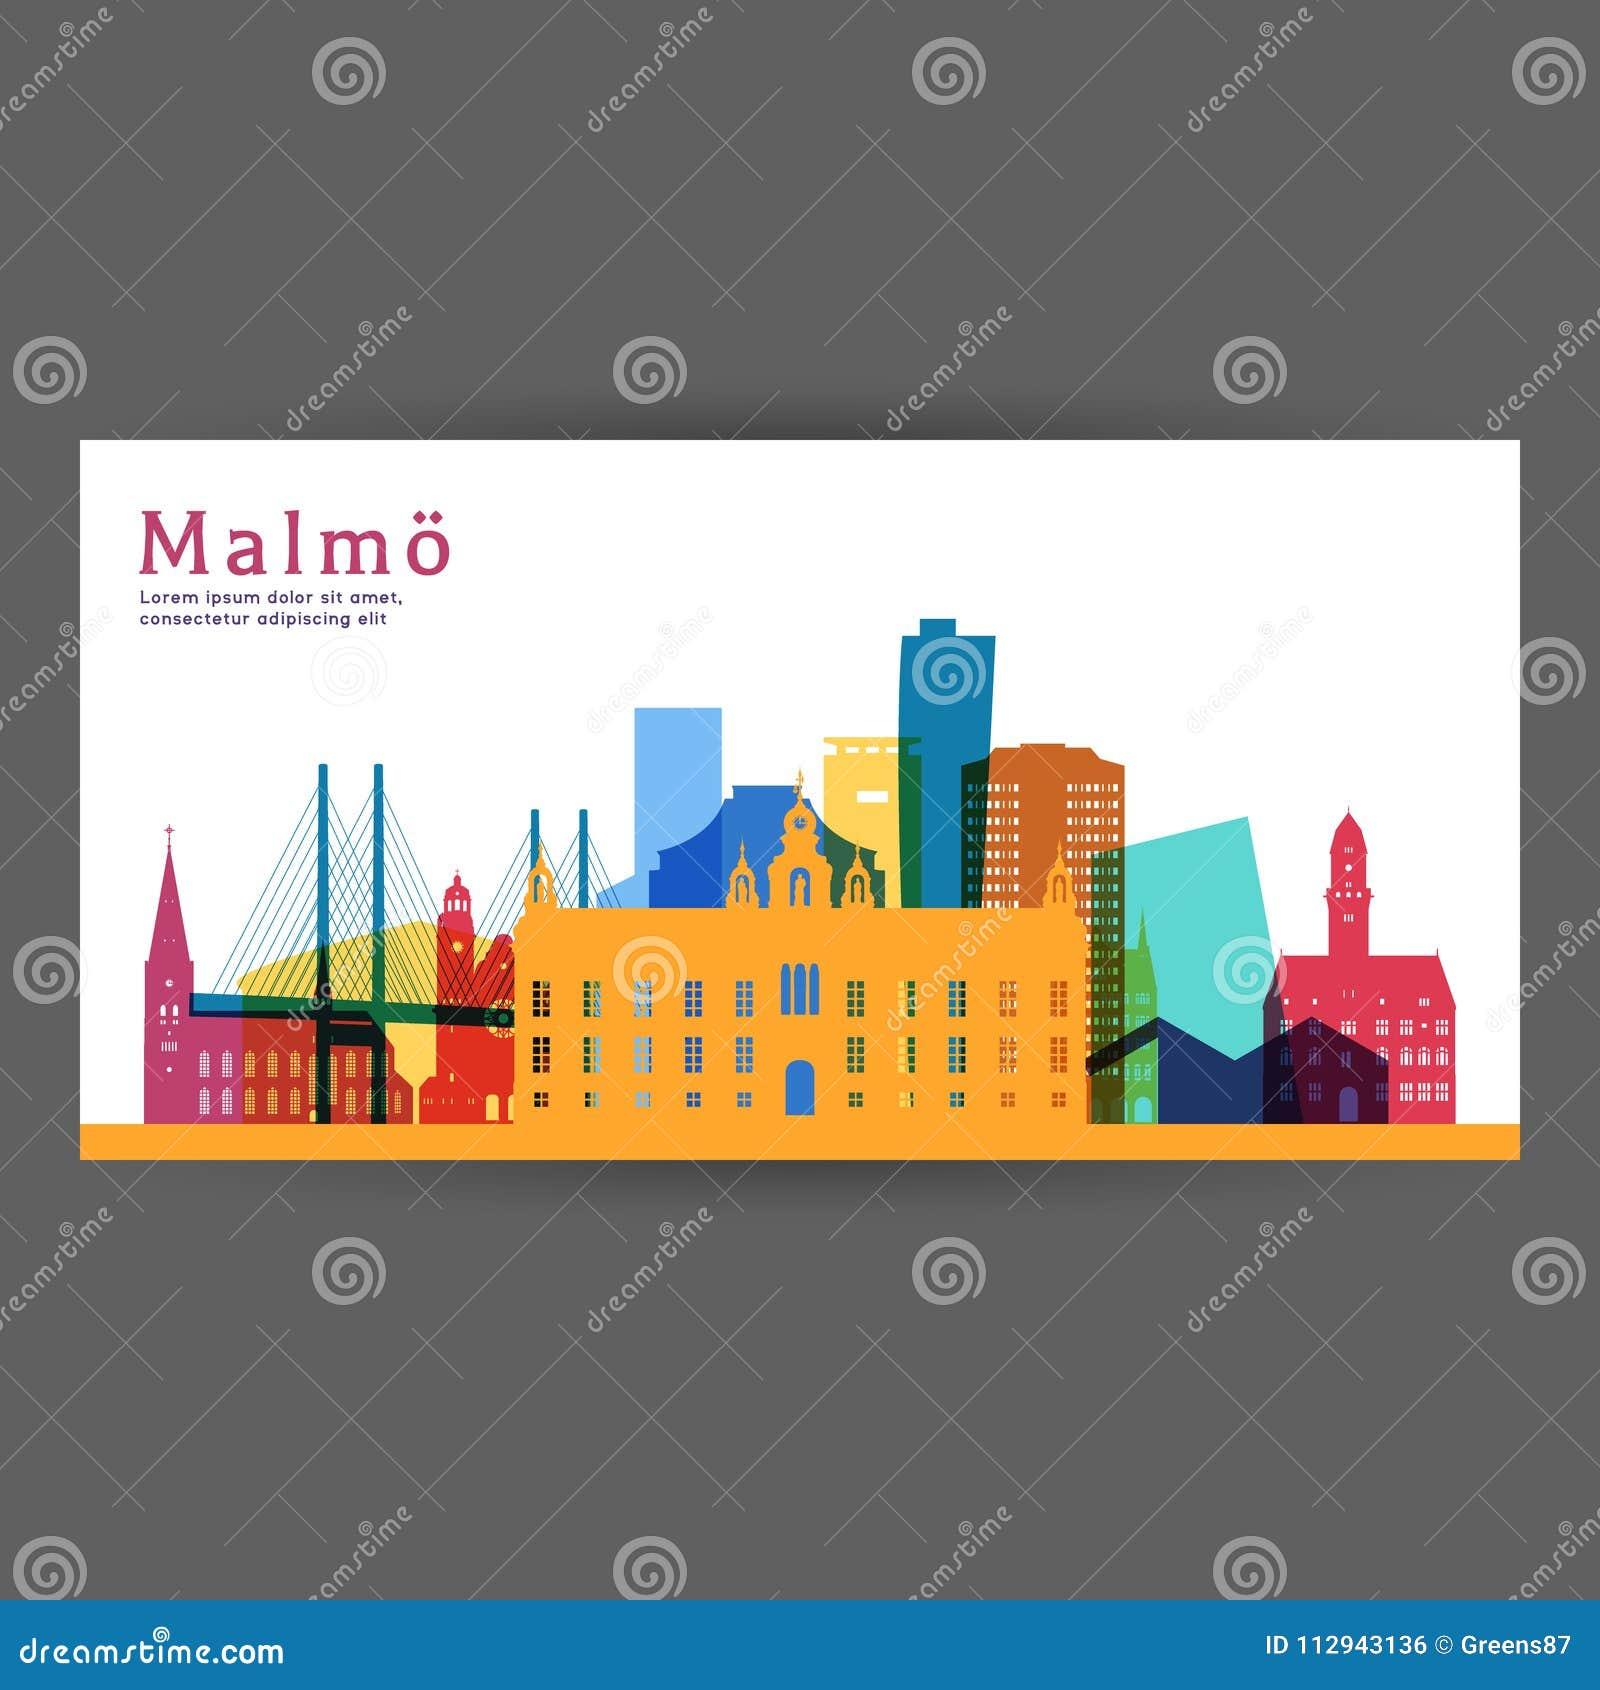 Malmo kleurrijke architectuur vectorillustratie